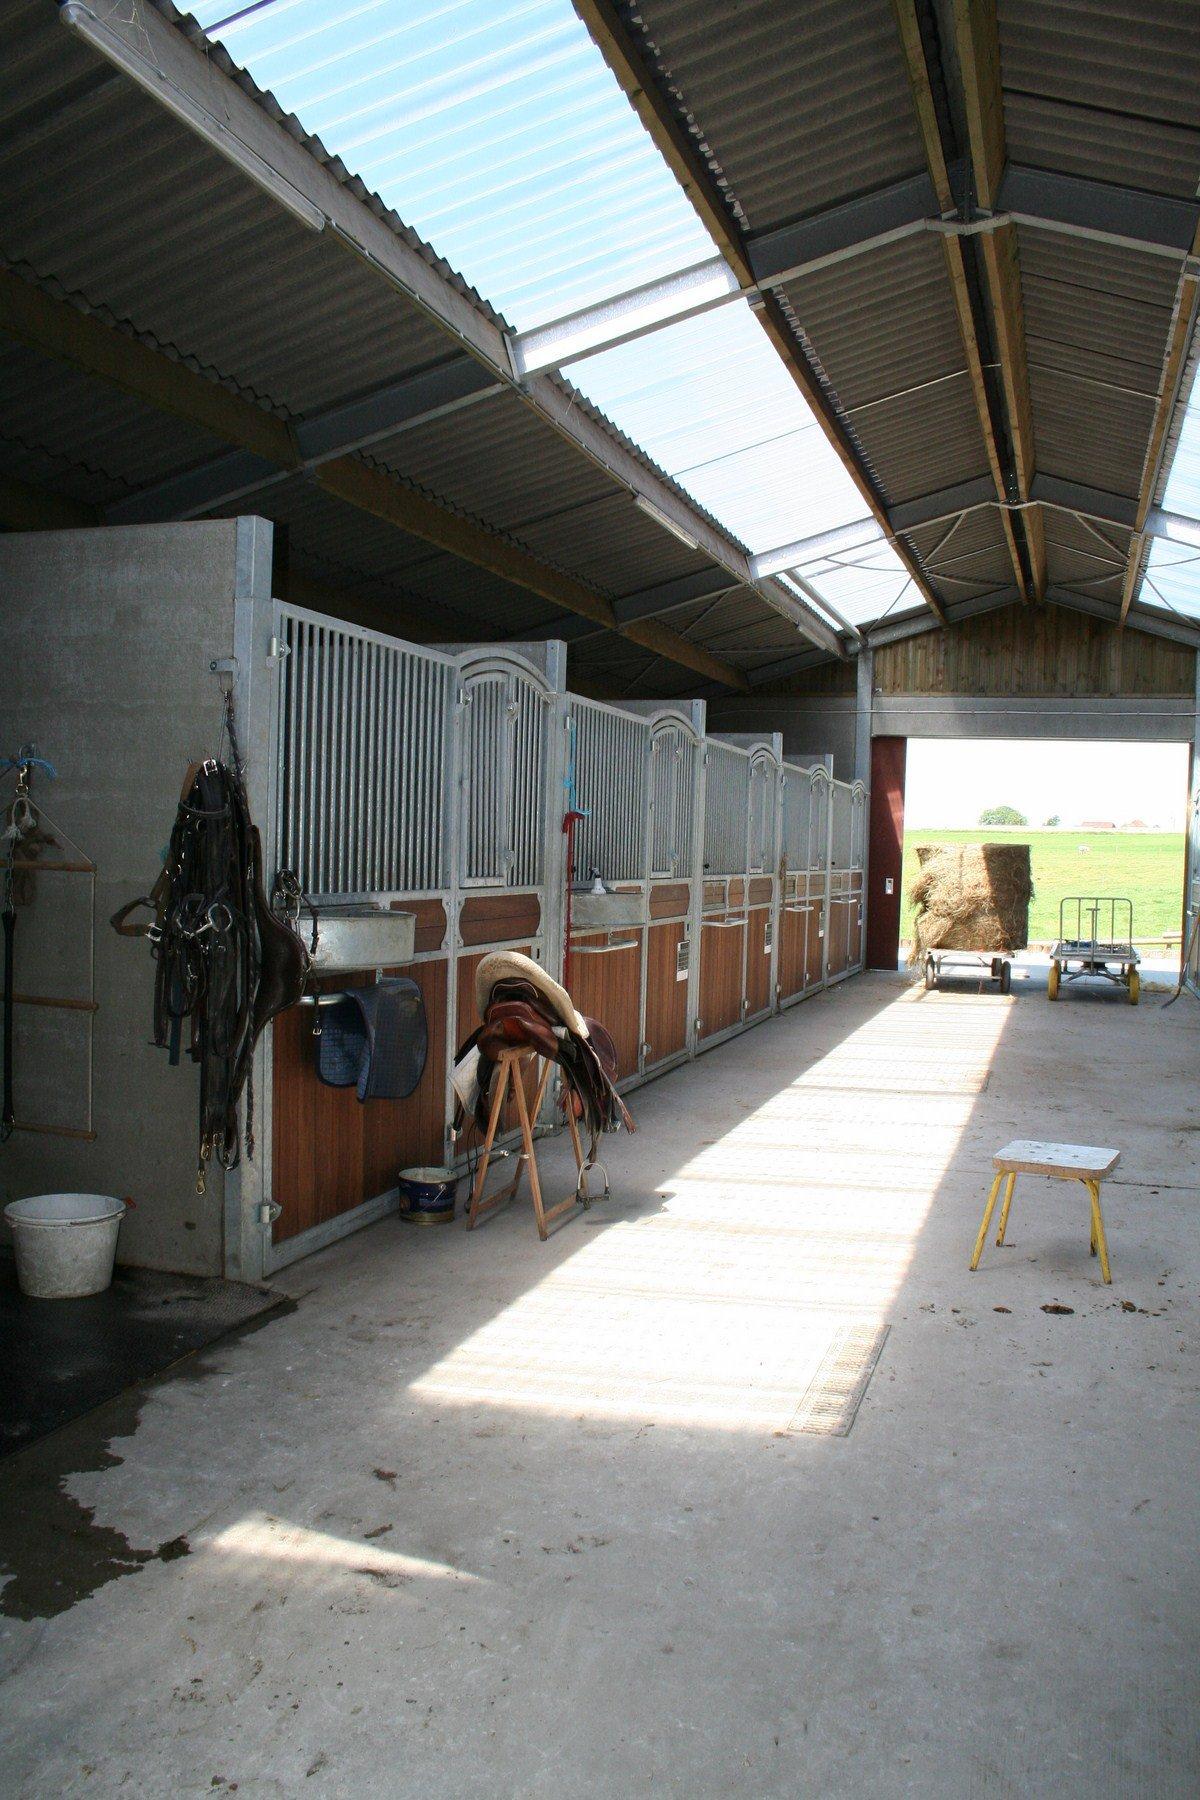 saint hermelle_paardenstallen_paardenboxen_binnenpiste_gouy les Pieton (18).jpg